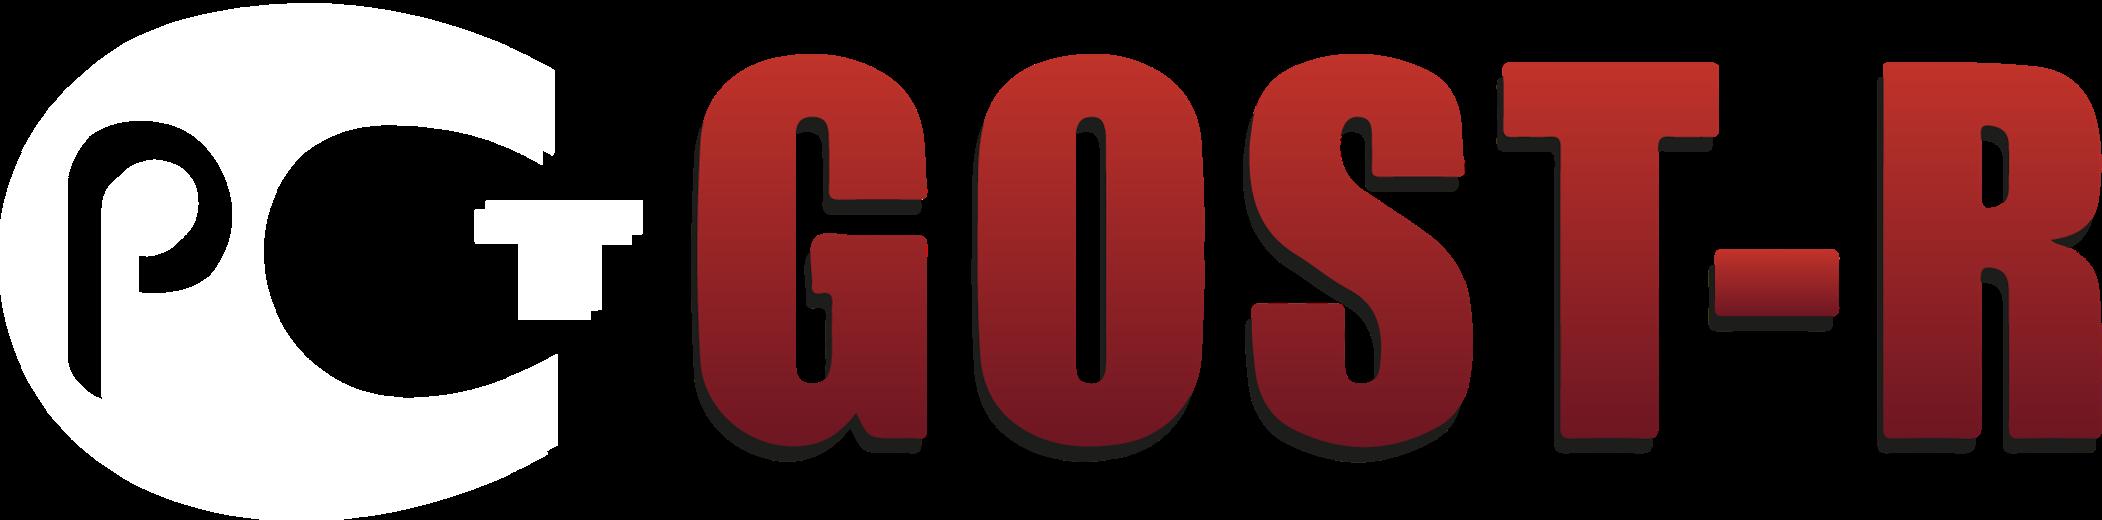 Gost-R Sertifika Merkezi - EAC Belgesi Gost Sertifikası